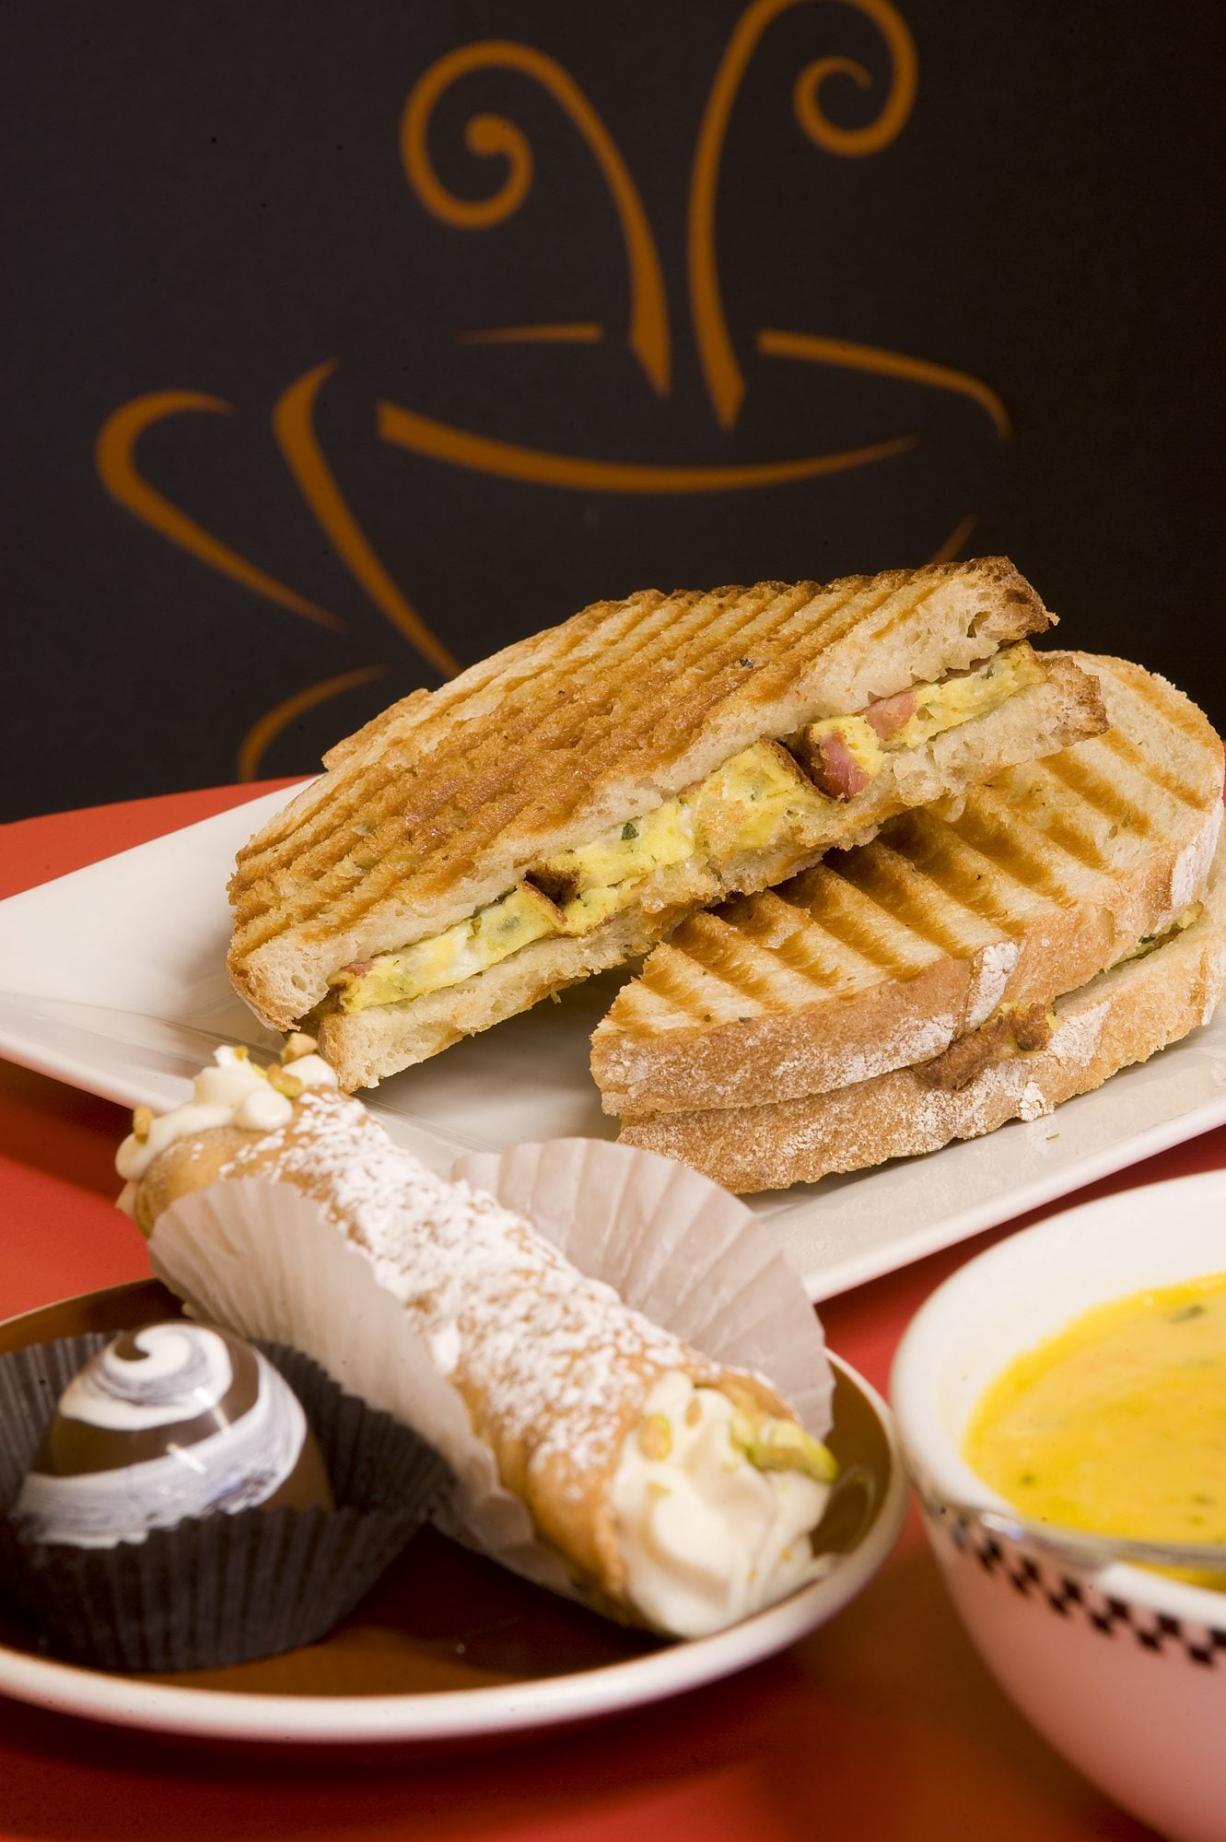 Frittata Panini Sandwich, Sweet Potato and Butternut Squash Soup, Cannoli and Chocolate Truffle at DiTazza Gormet Coffee and Cafe.